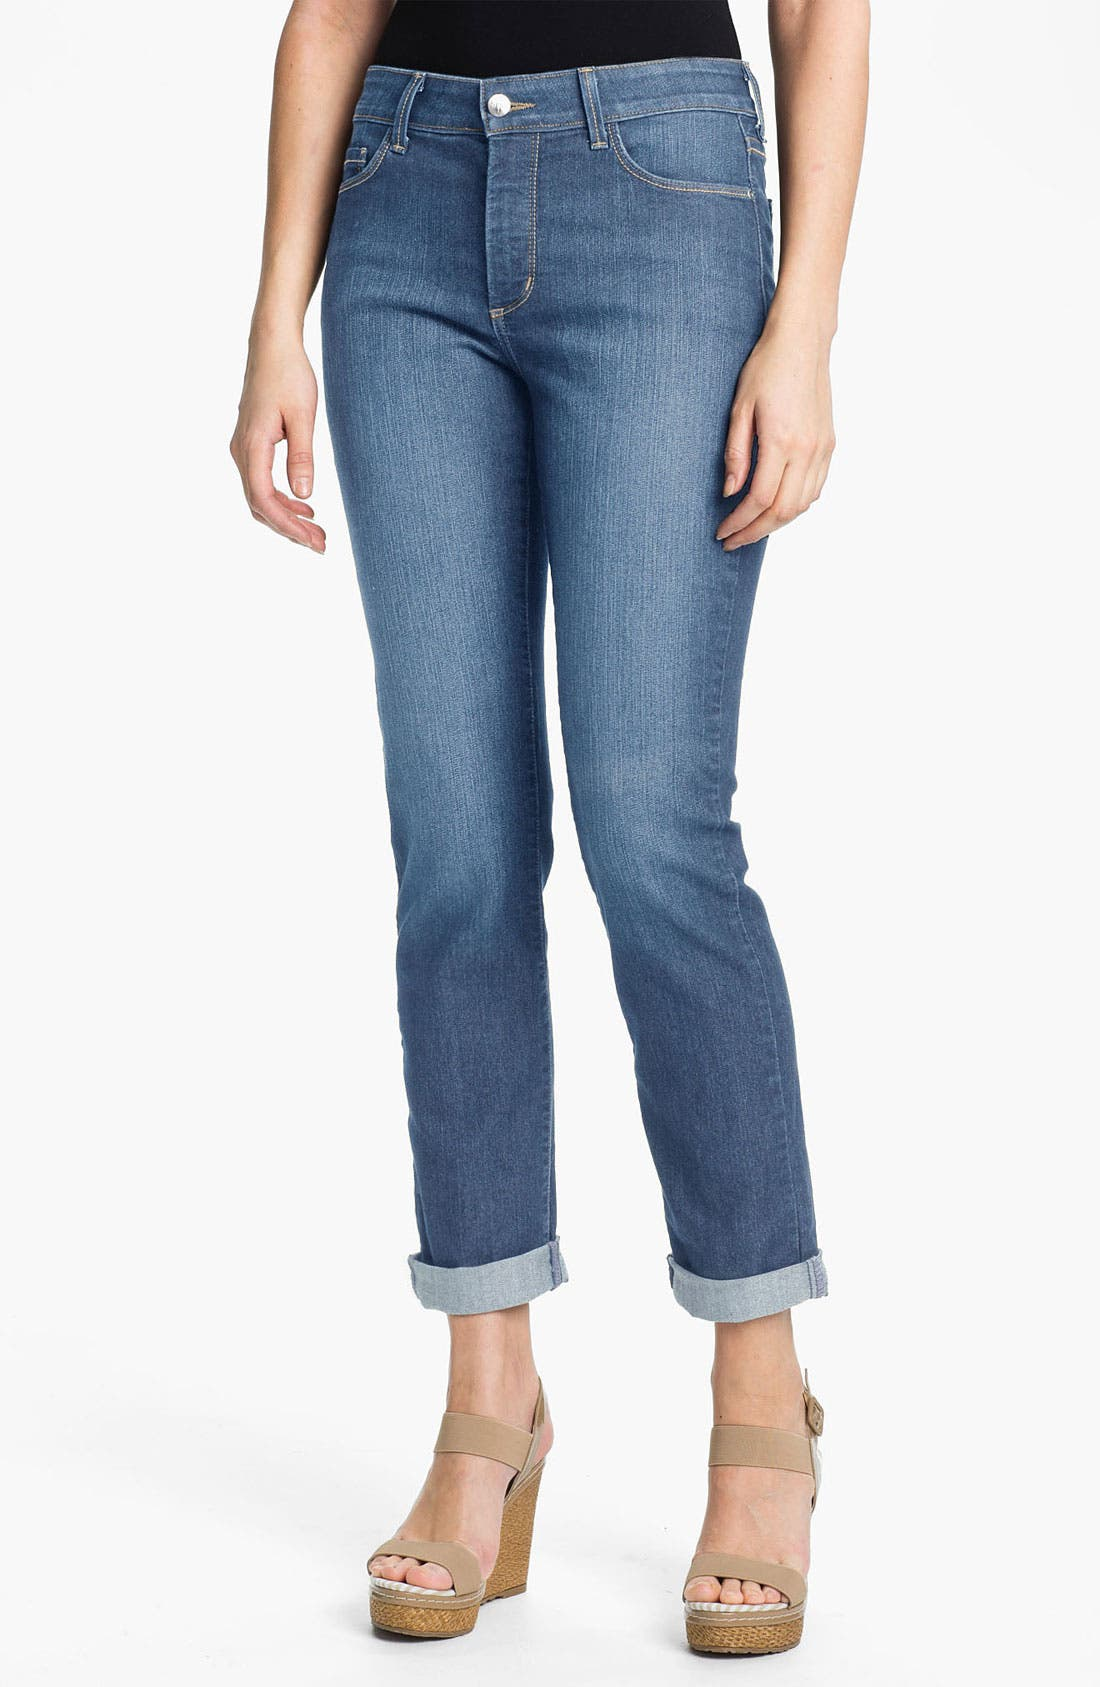 Alternate Image 1 Selected - NYDJ 'Tanya' Cuffed Stretch Boyfriend Jeans